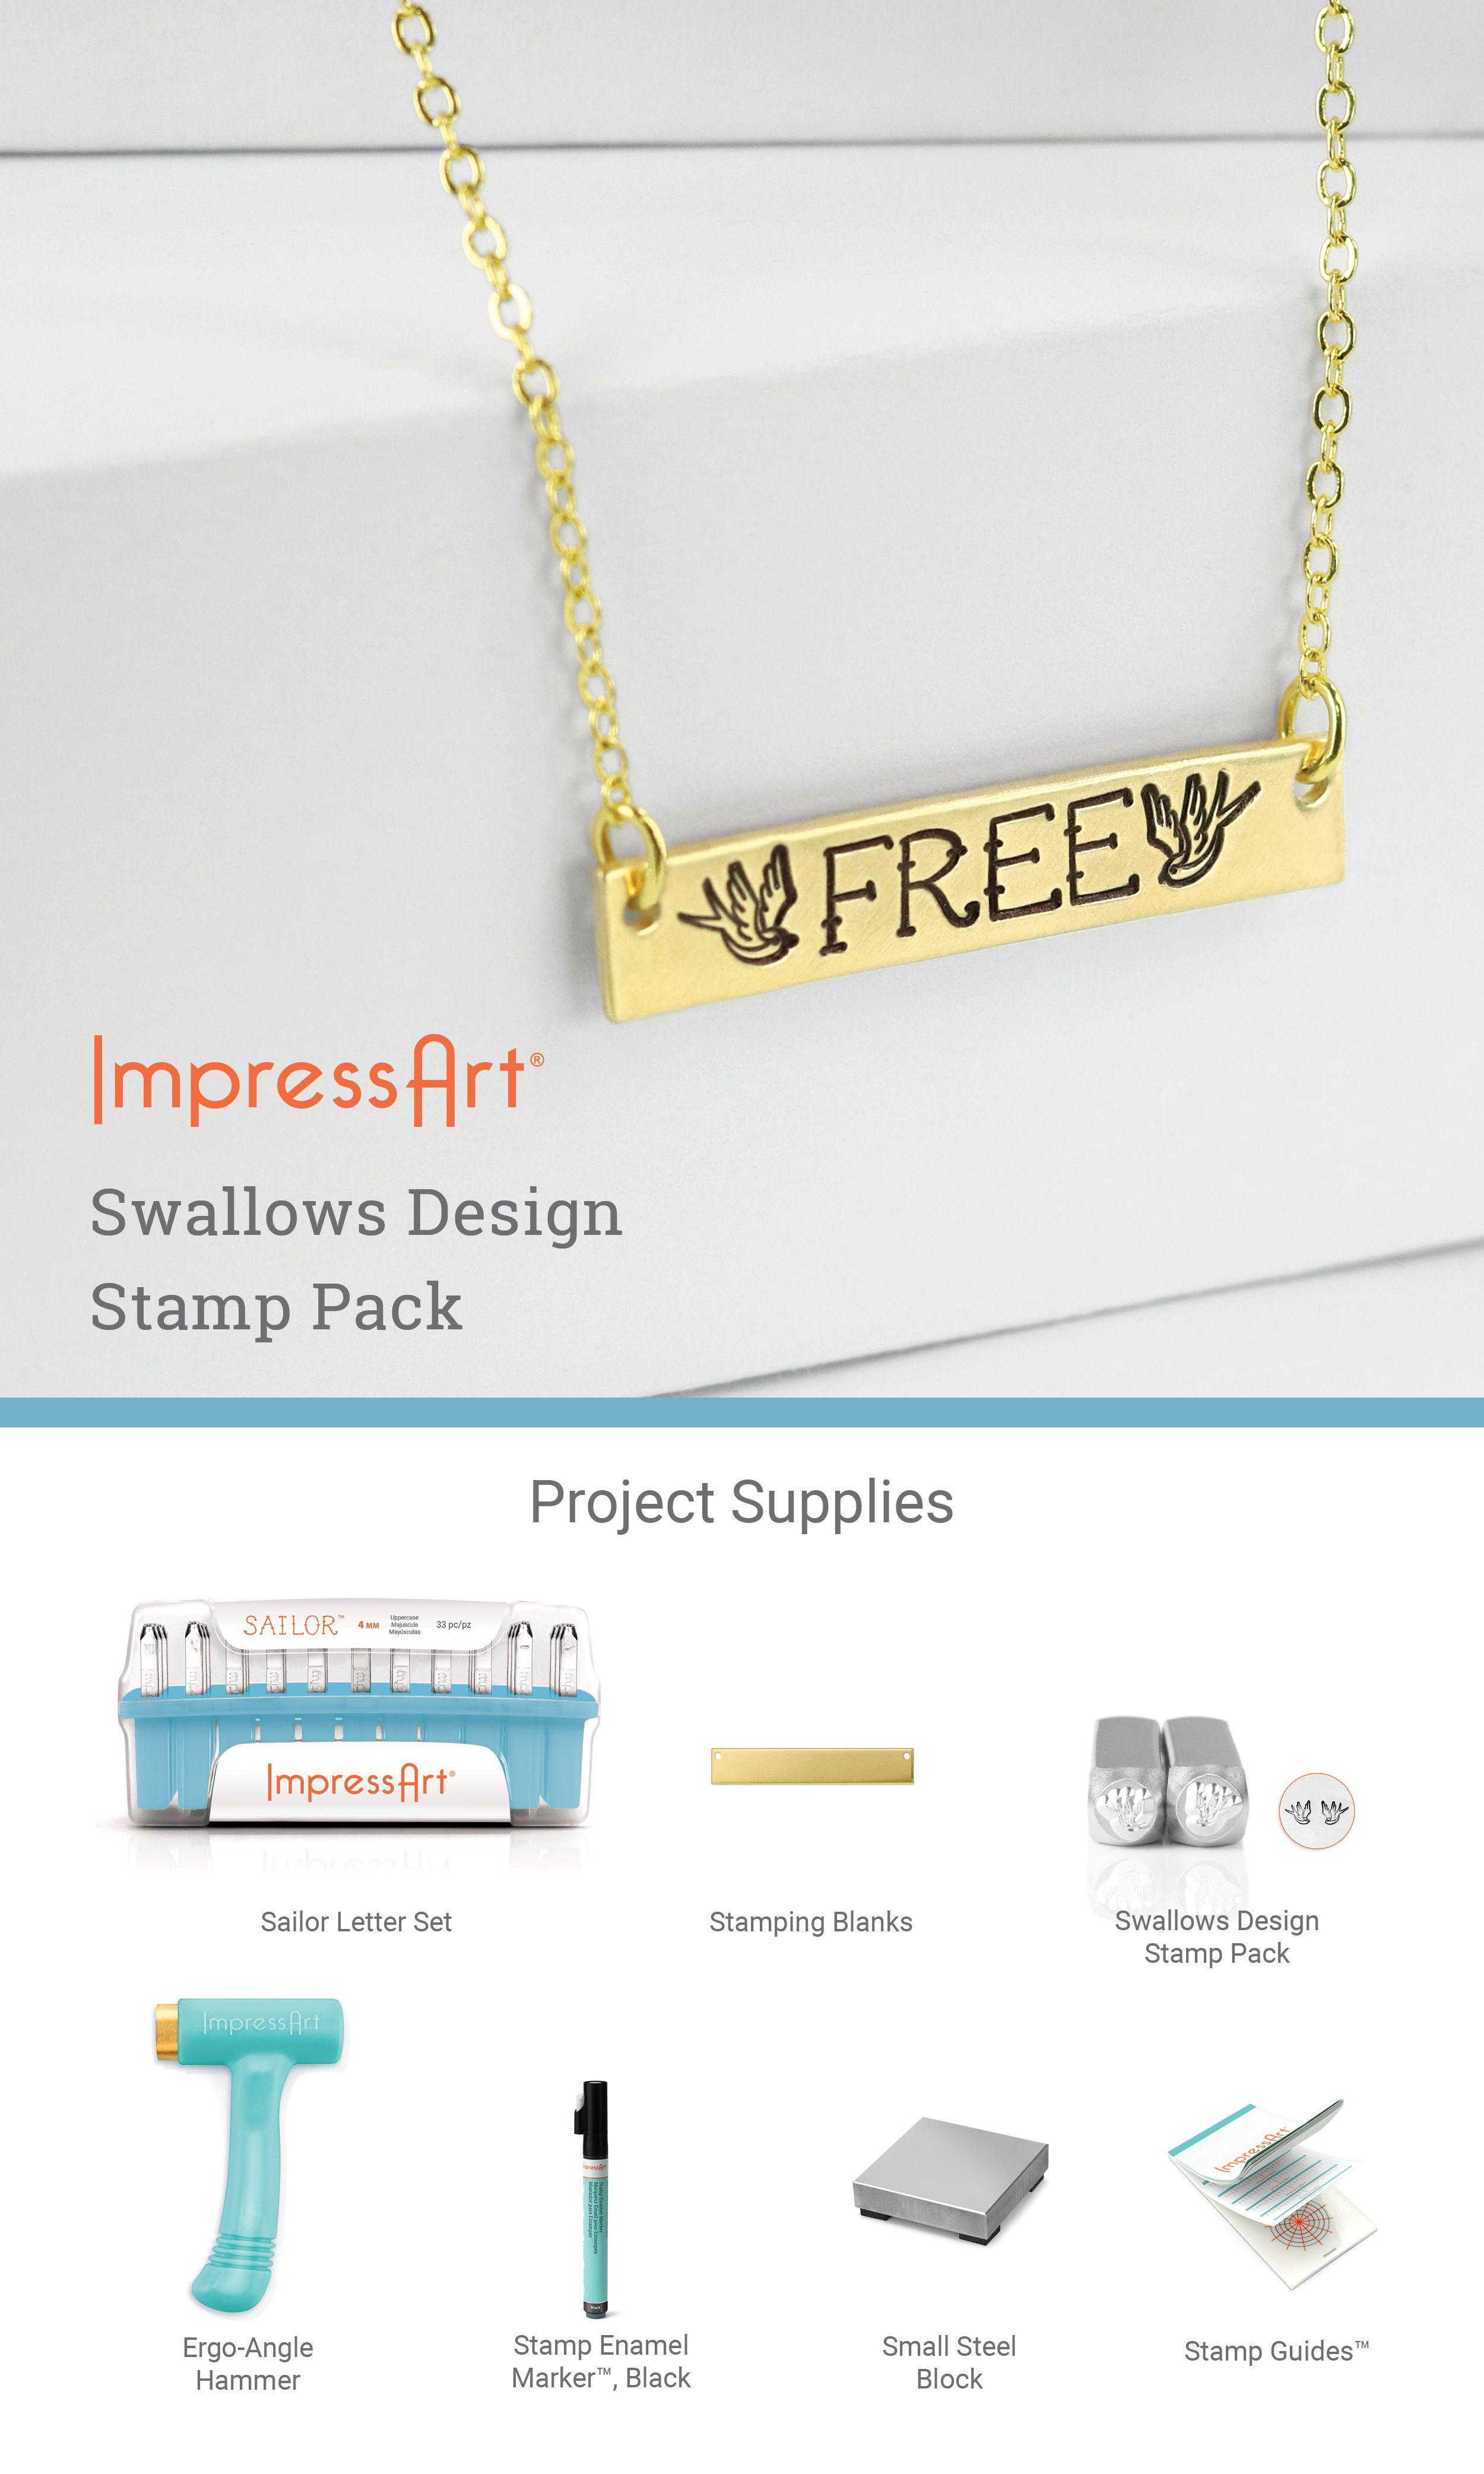 ImpressArt Swallows Metal Stamp Pack 6mm